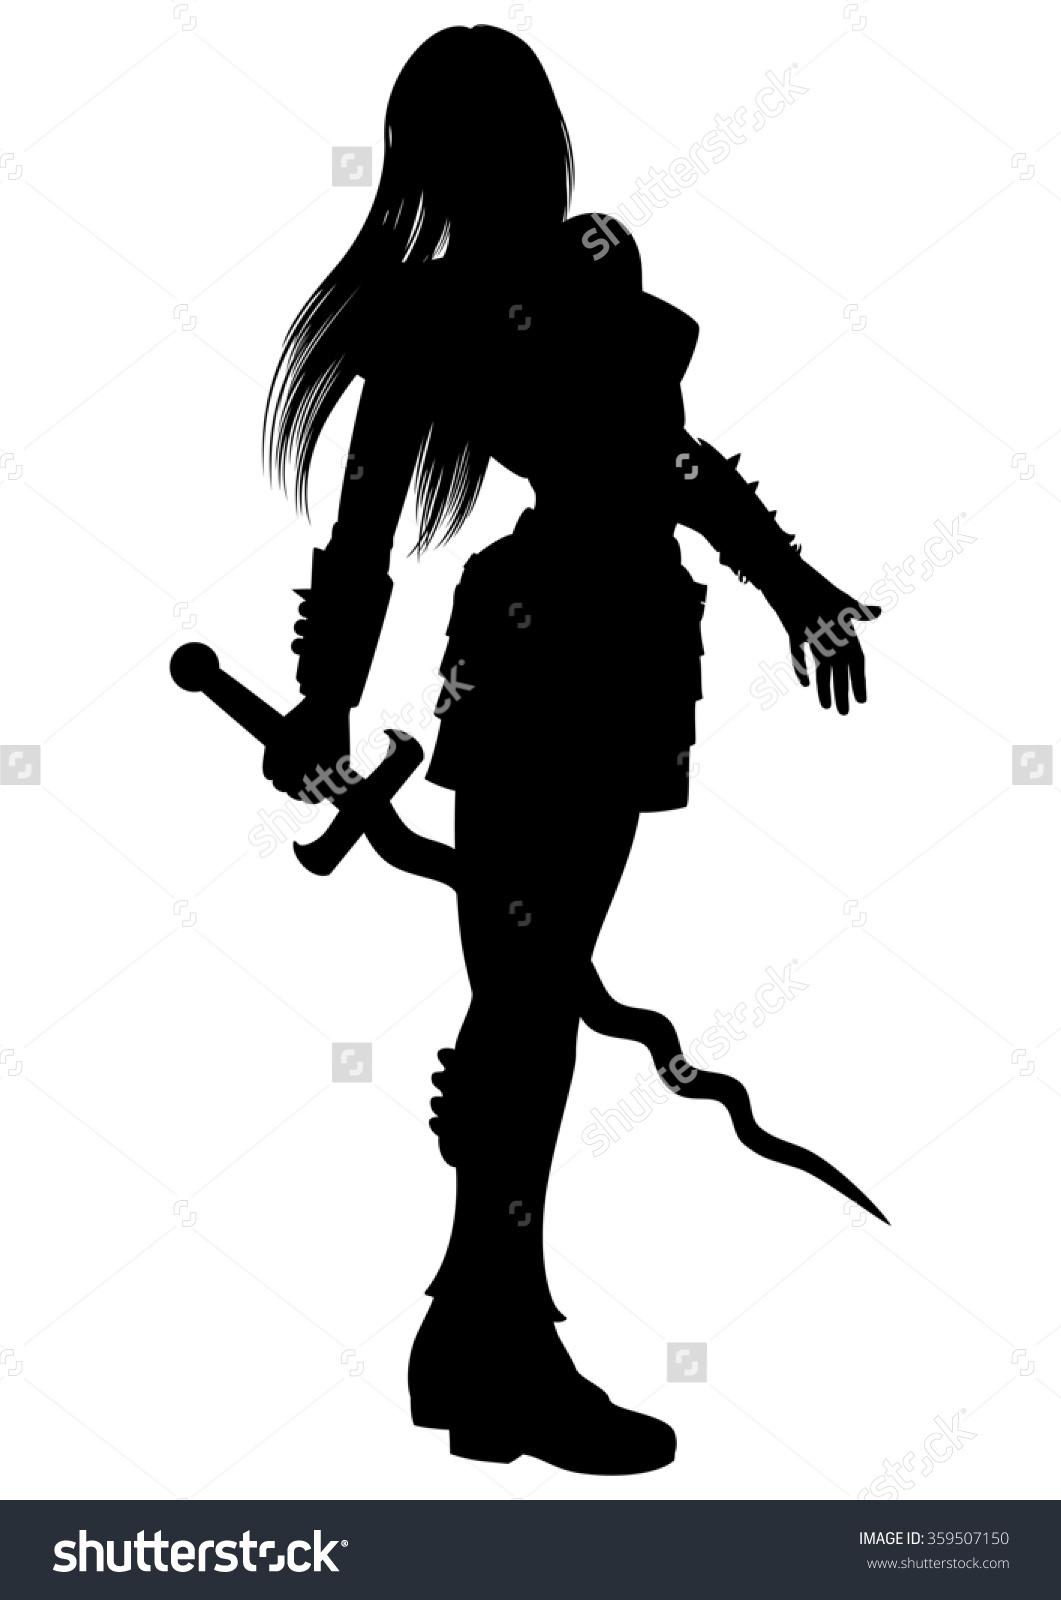 Woman Warrior clipart silhouette Warrior Woman Clipart Woman Clipart